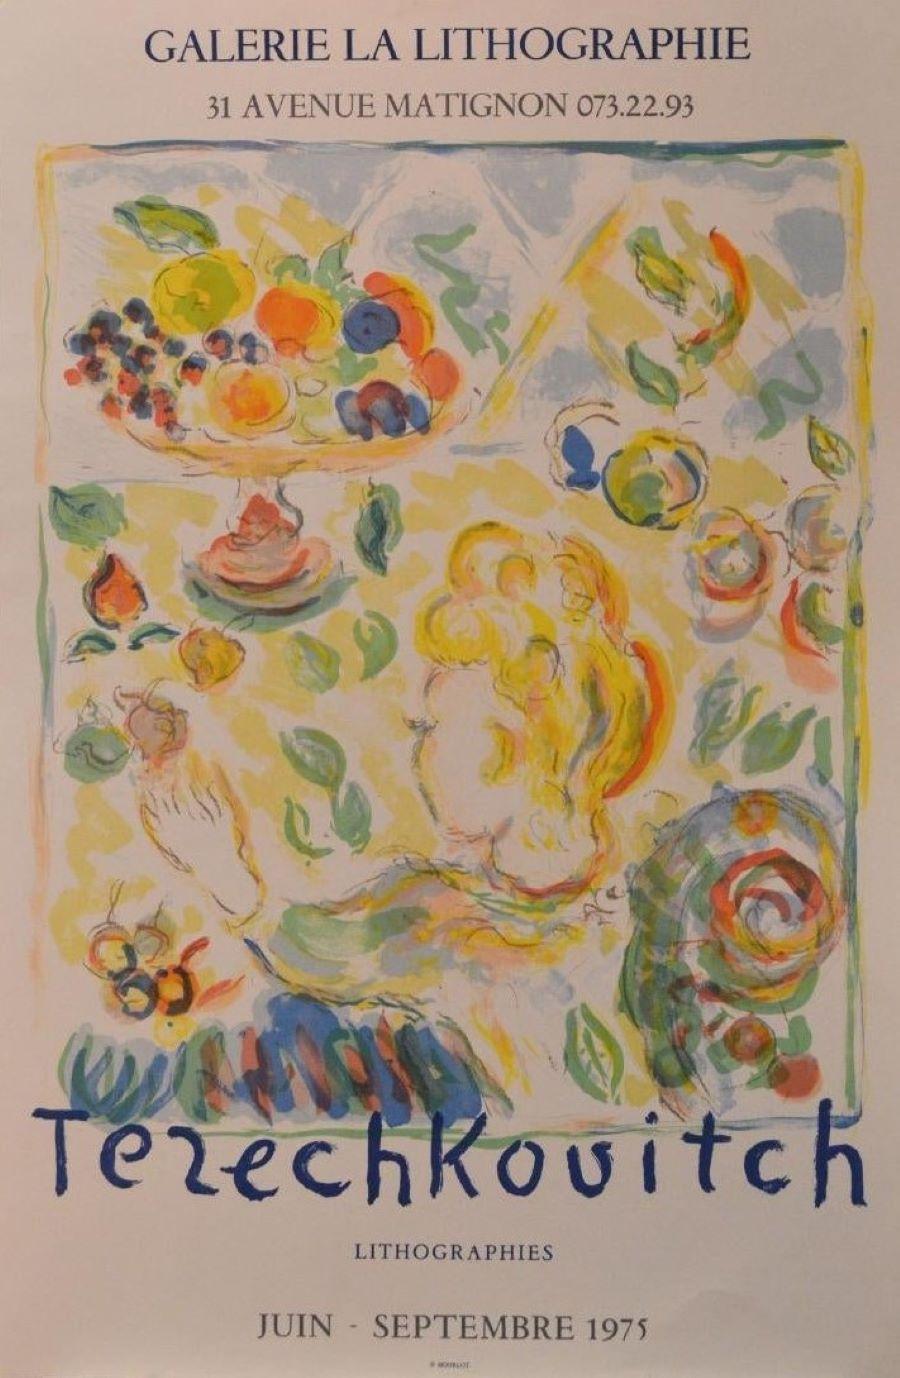 Galerie La Lithographie-Vintage Event Poster. Published by Mourlot